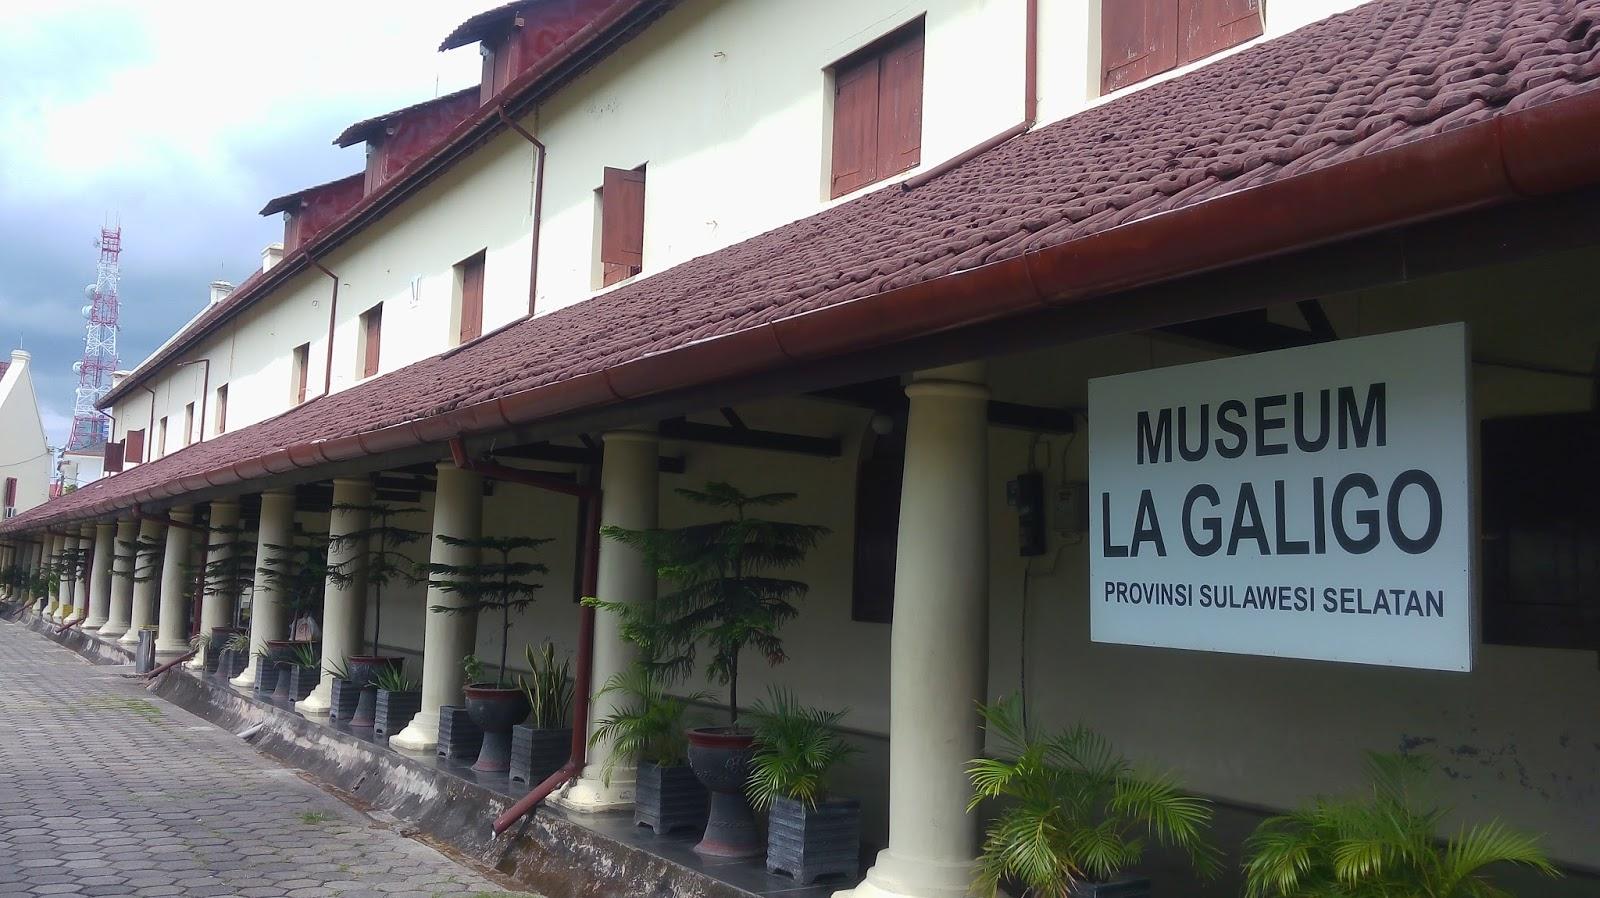 Optimalisasi Fungsi Penting Museum La Galigo Makassar Sebagai Daya Tarik